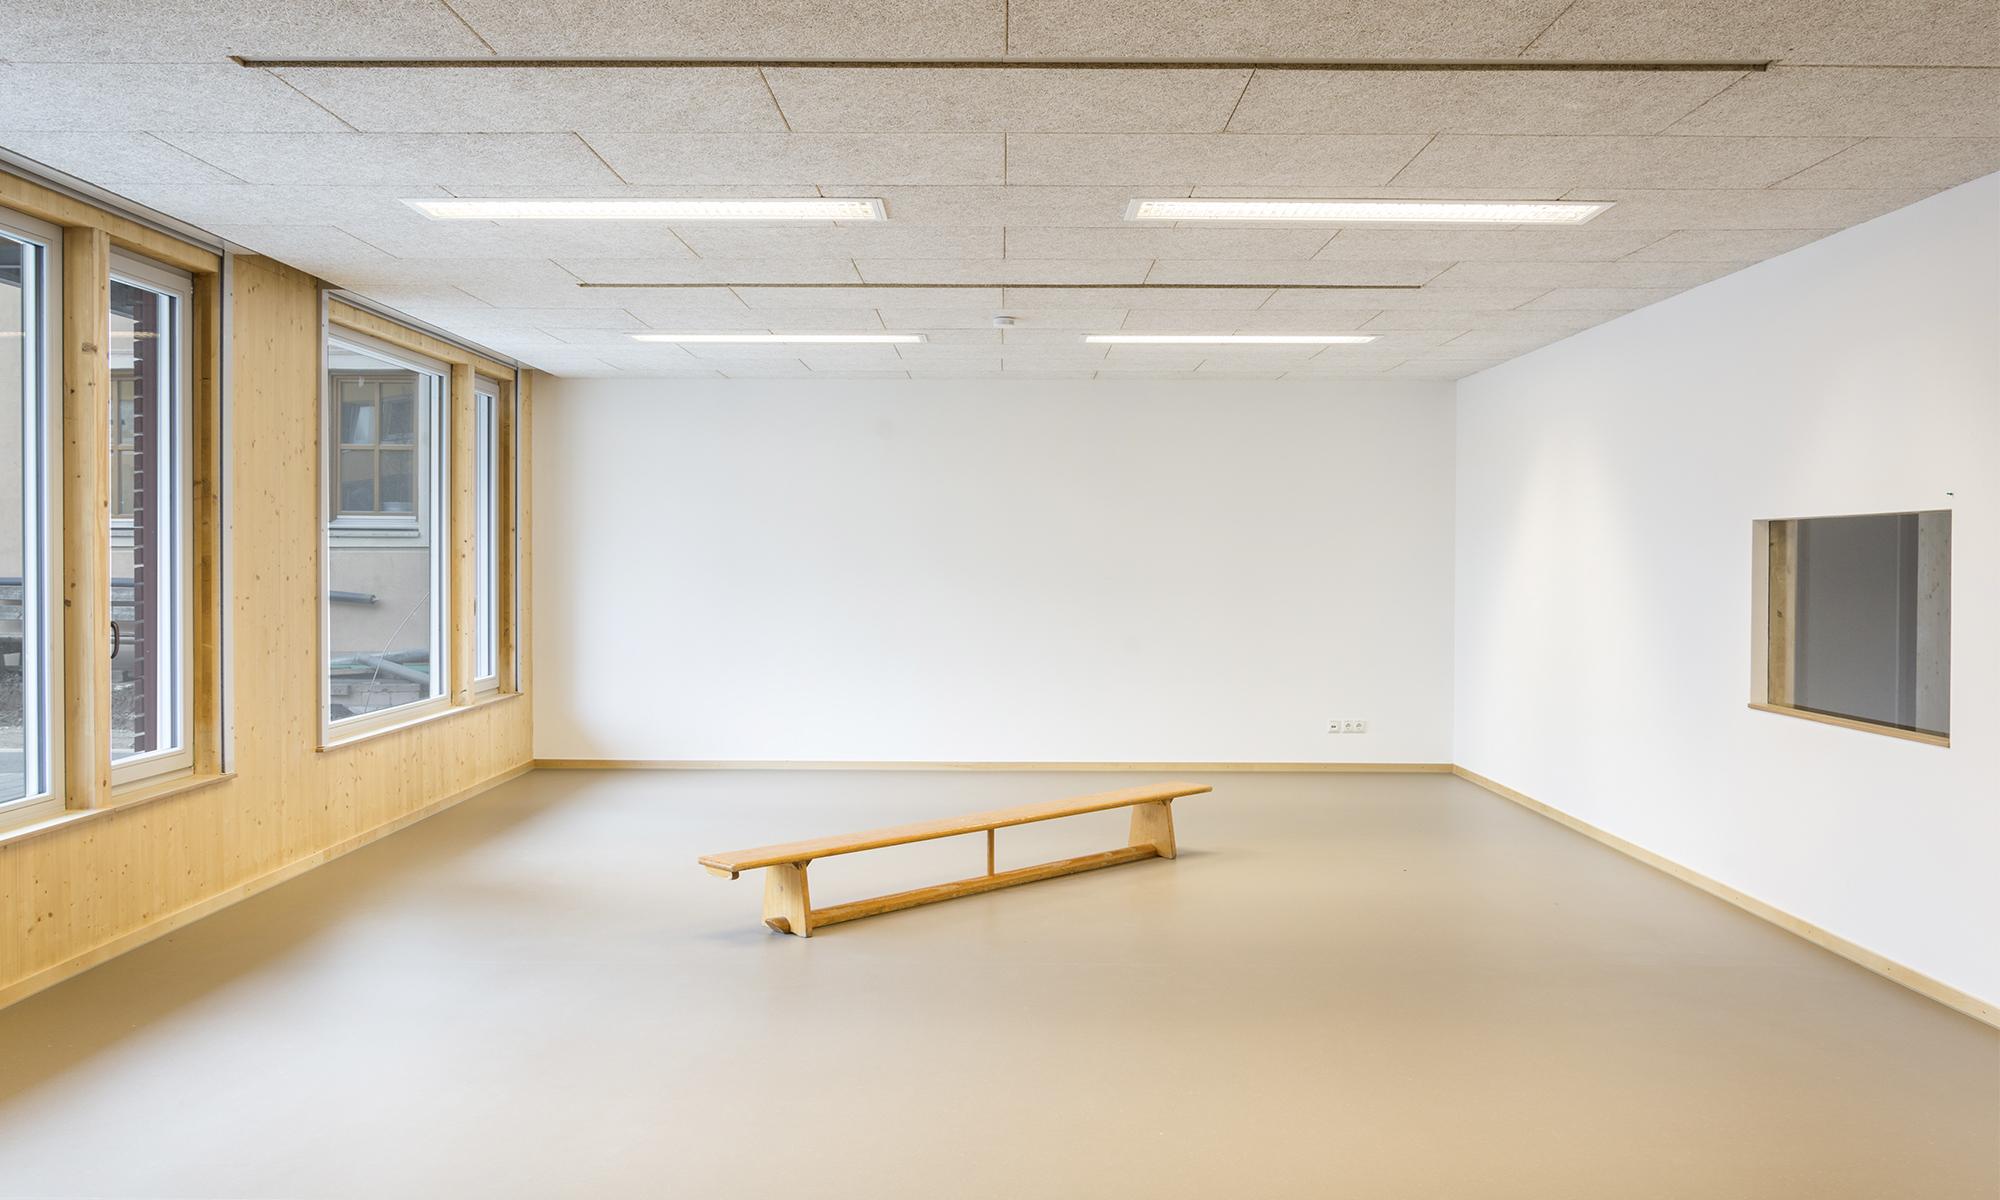 Architekten Rößner + Waldmann